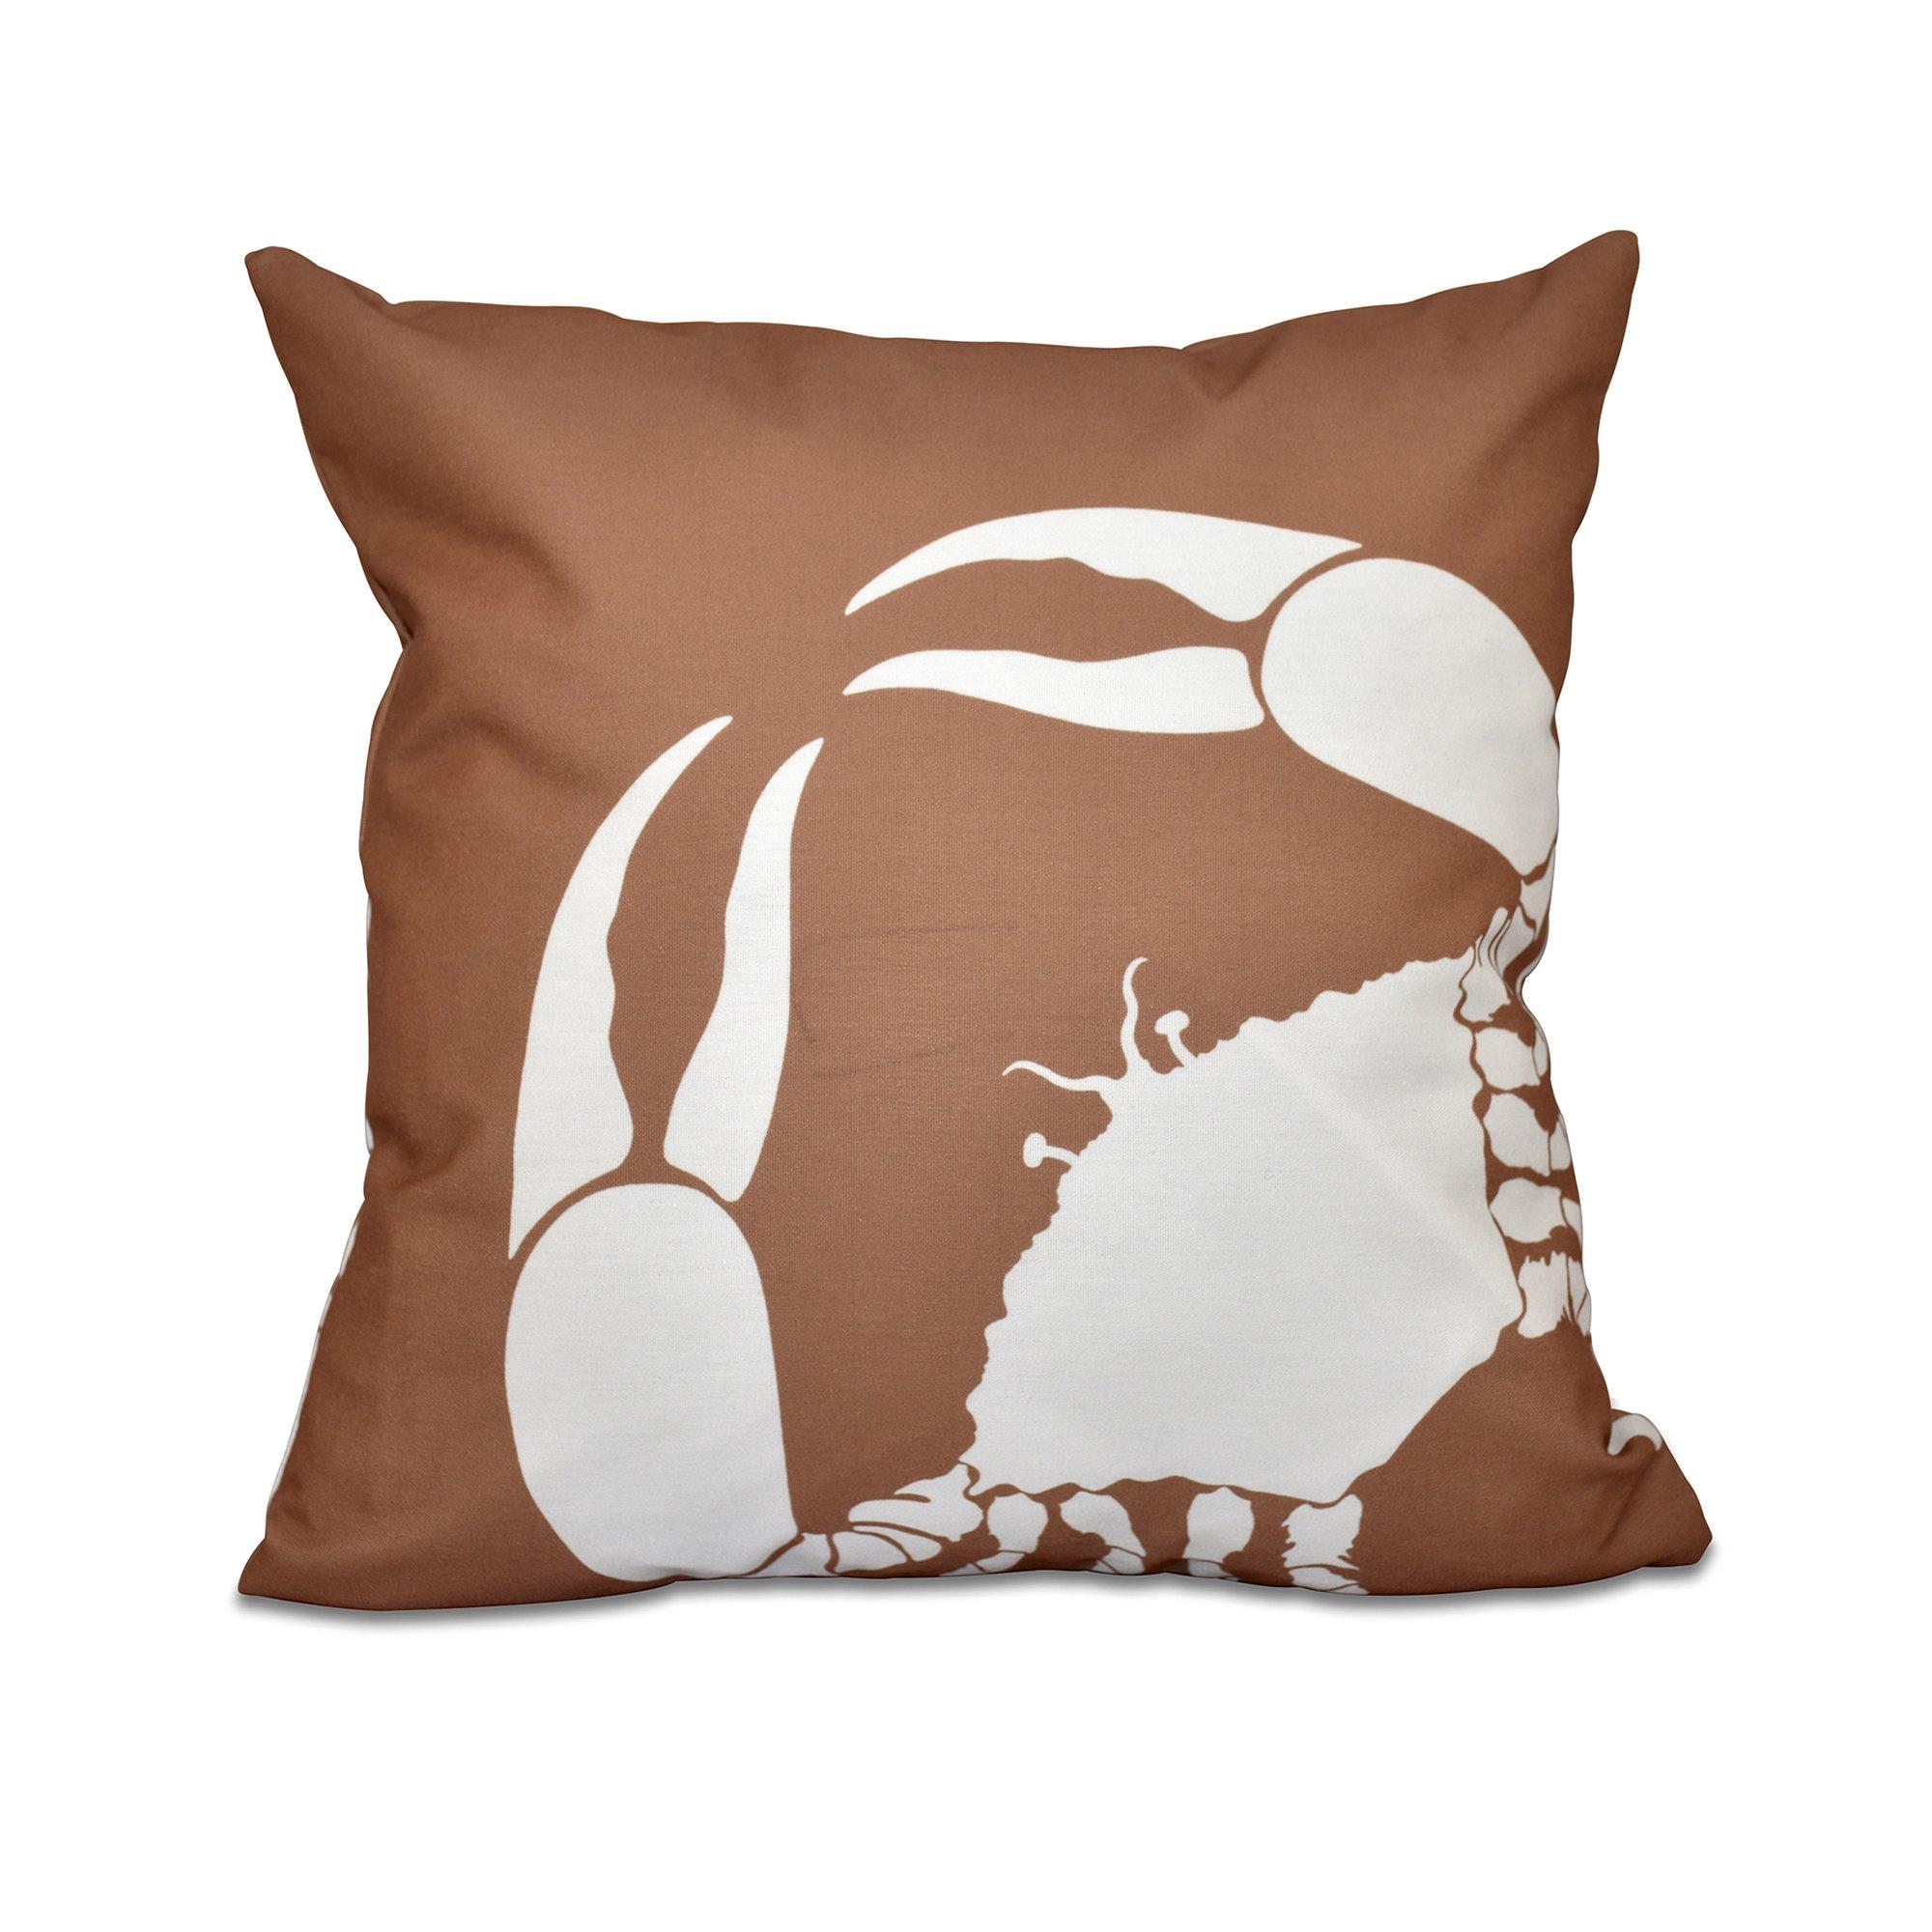 E by design O5PAN468TA8-18 18 x 18'' Crab Dip Animal Print Brown Outdoor Pillow